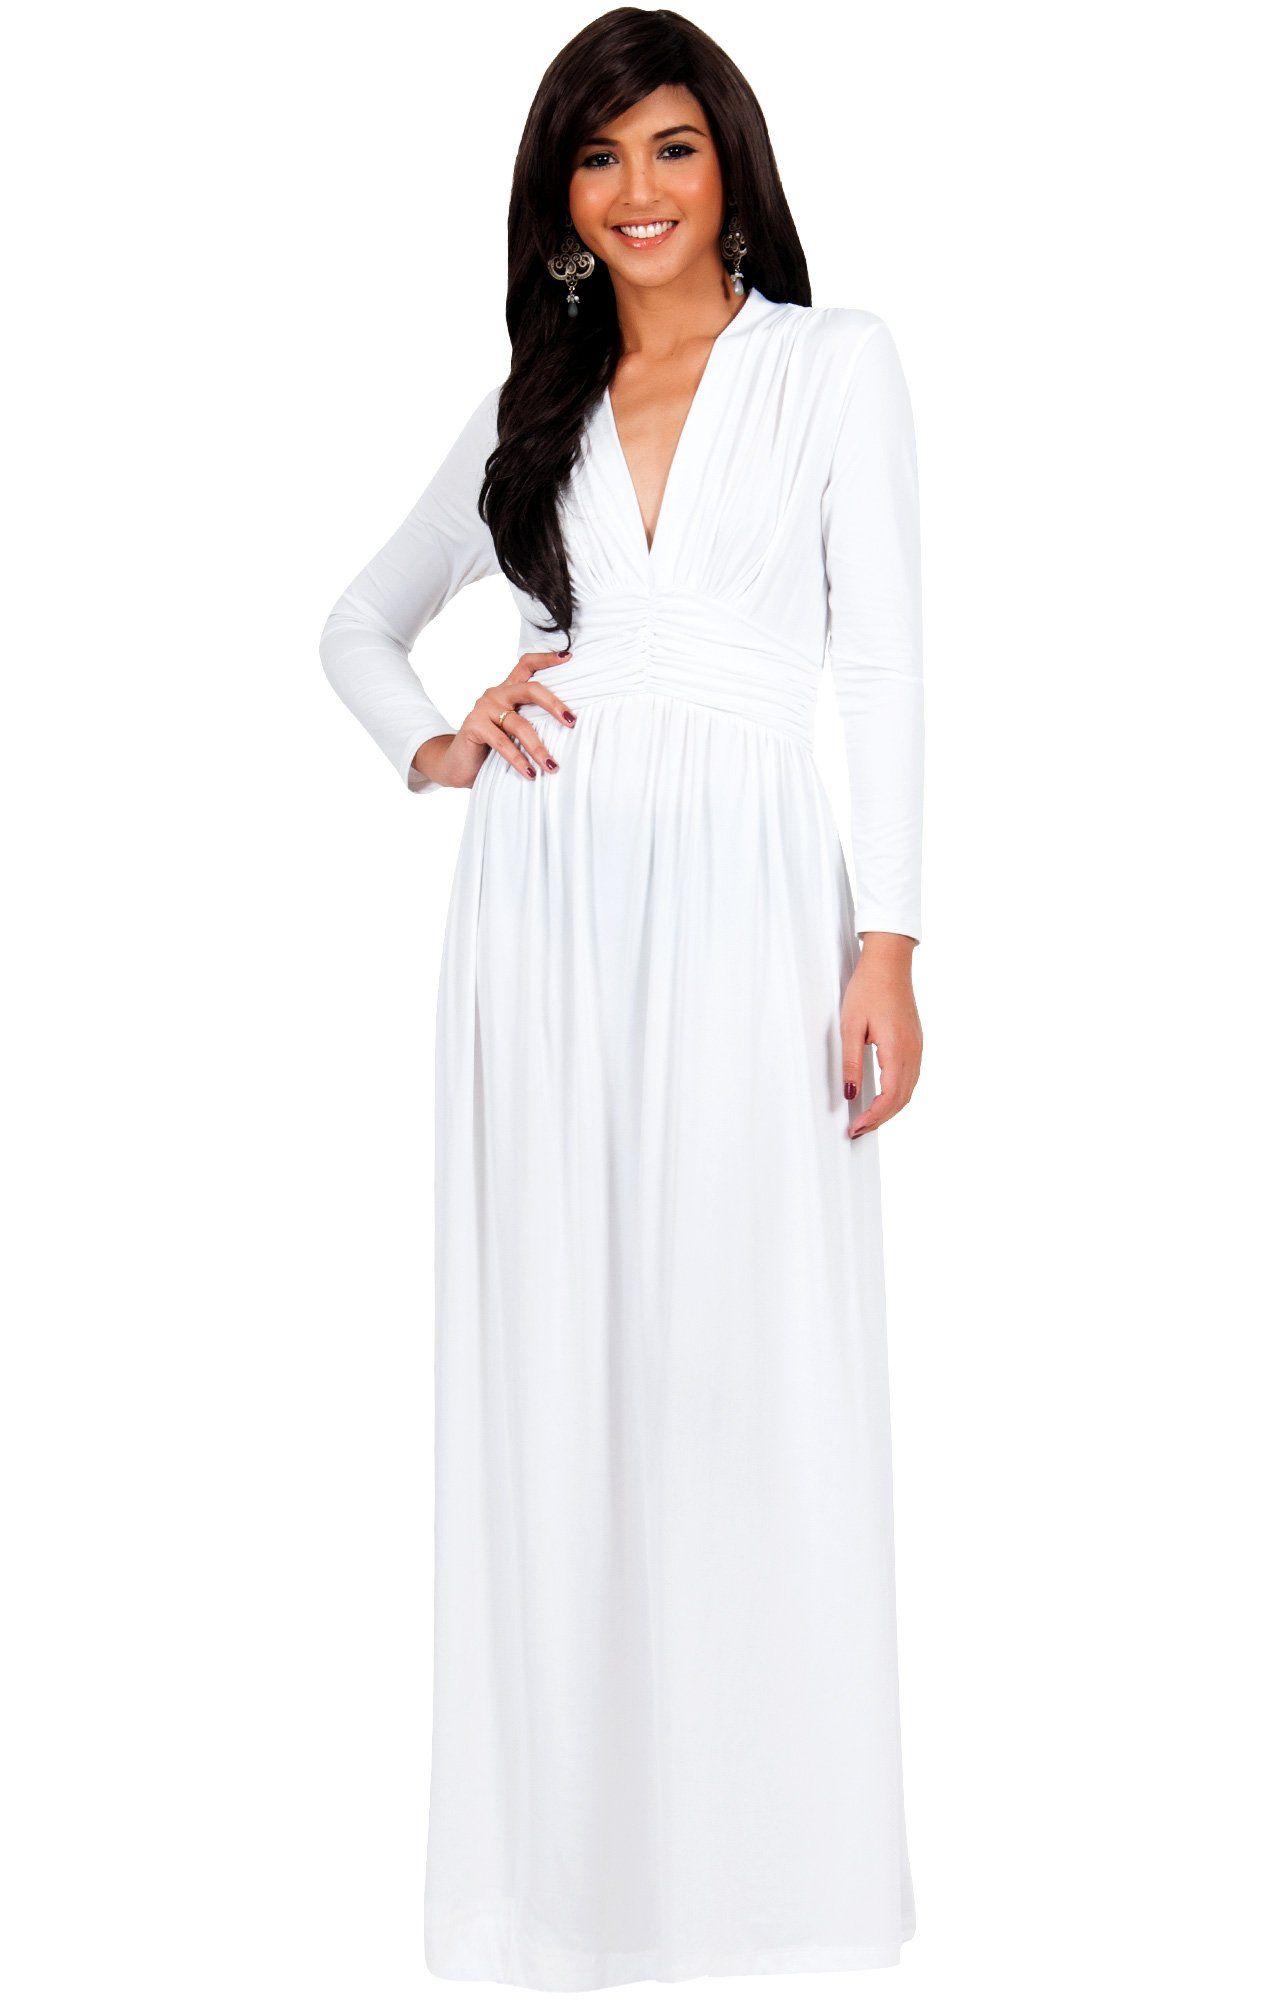 Koh koh womenus vintage inspired vneck long sleeve evening maxi